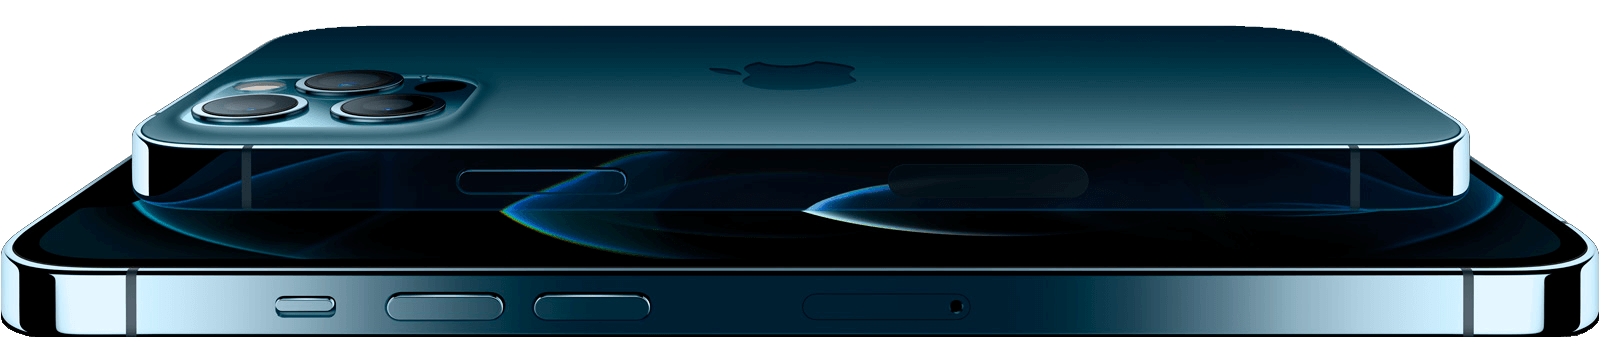 Oferta iPhone 12 Pro Max Azul Pacífico